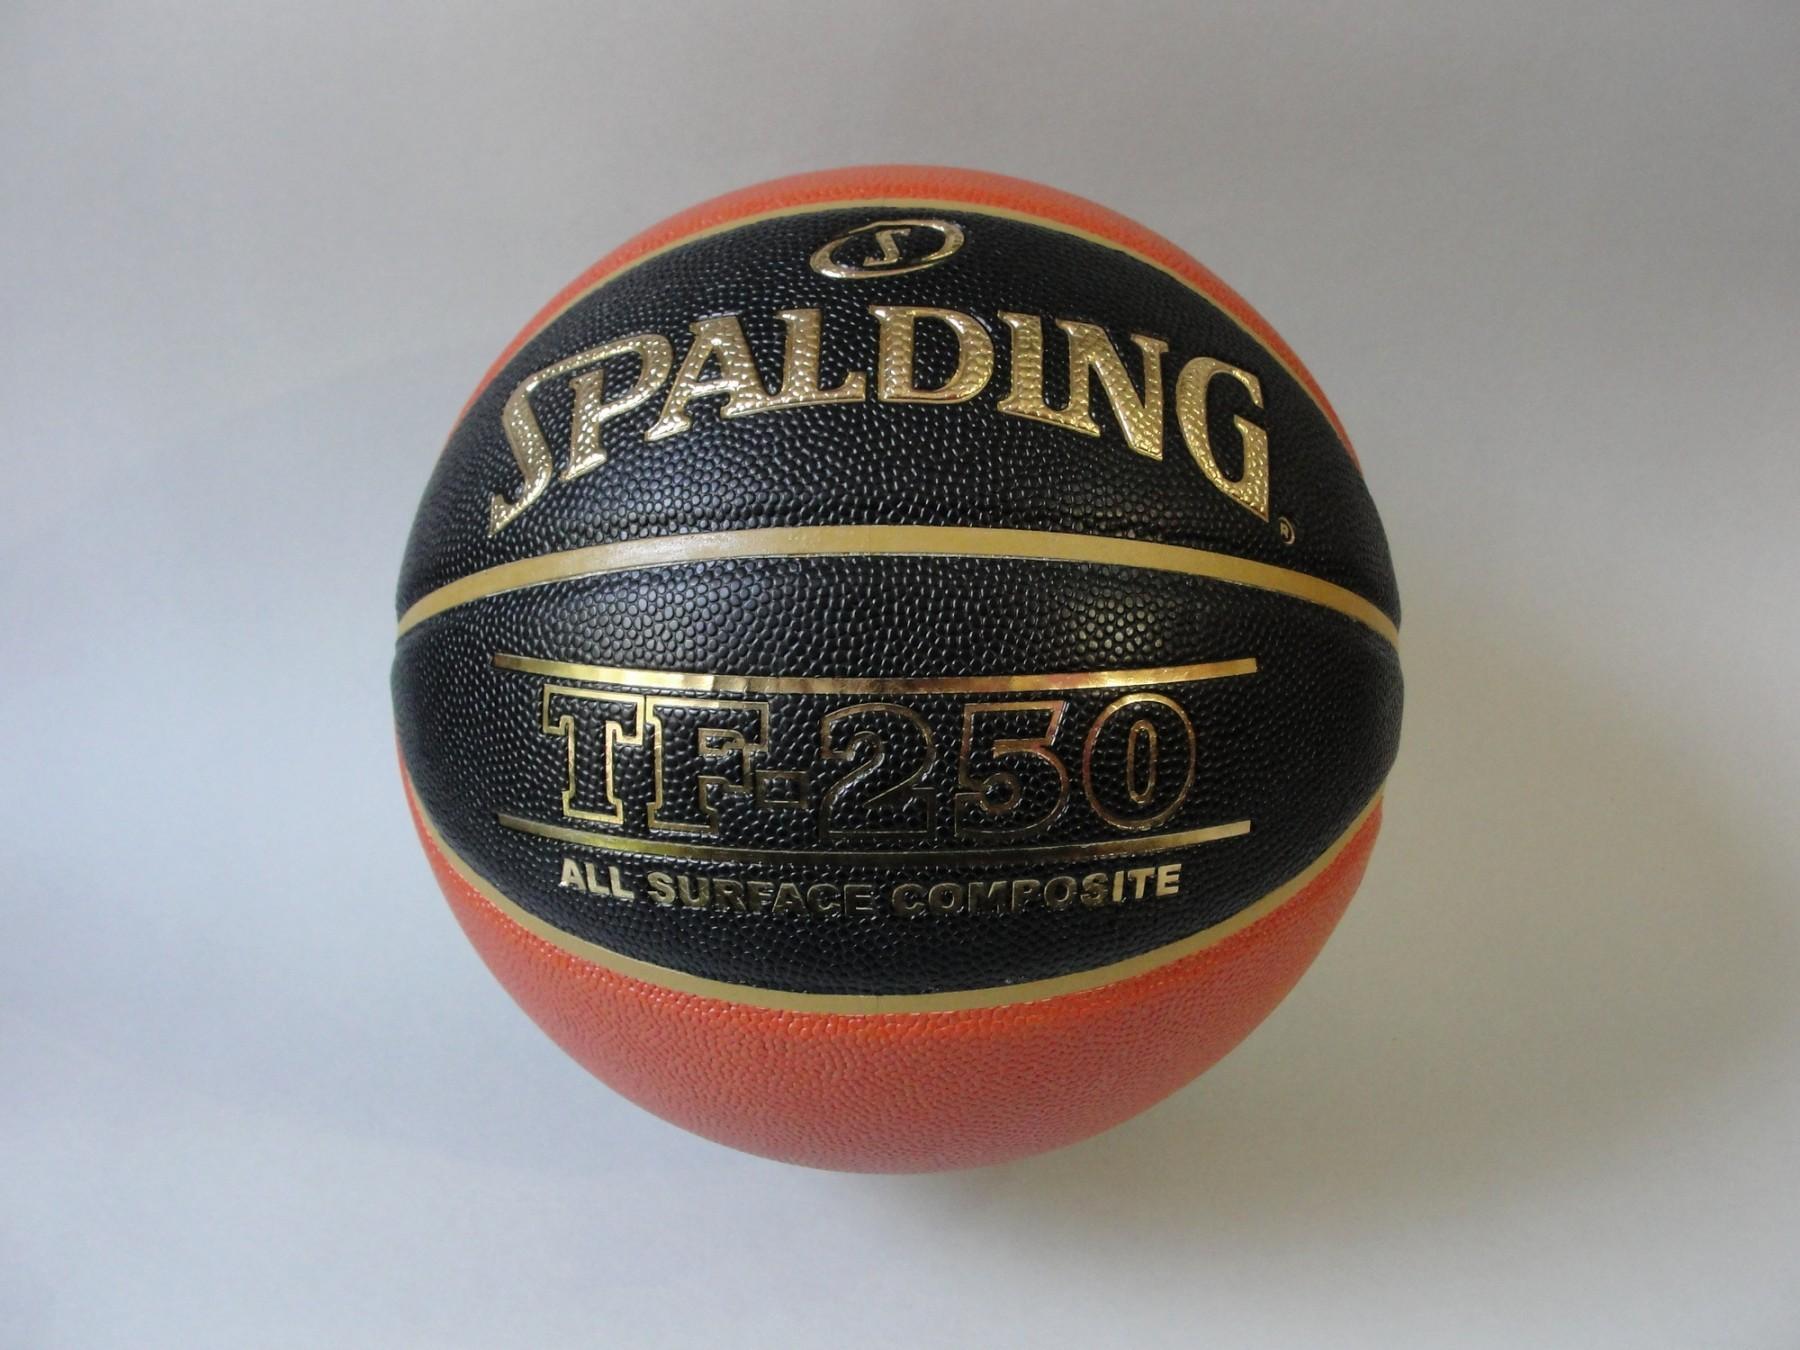 online upoznavanje s loptom